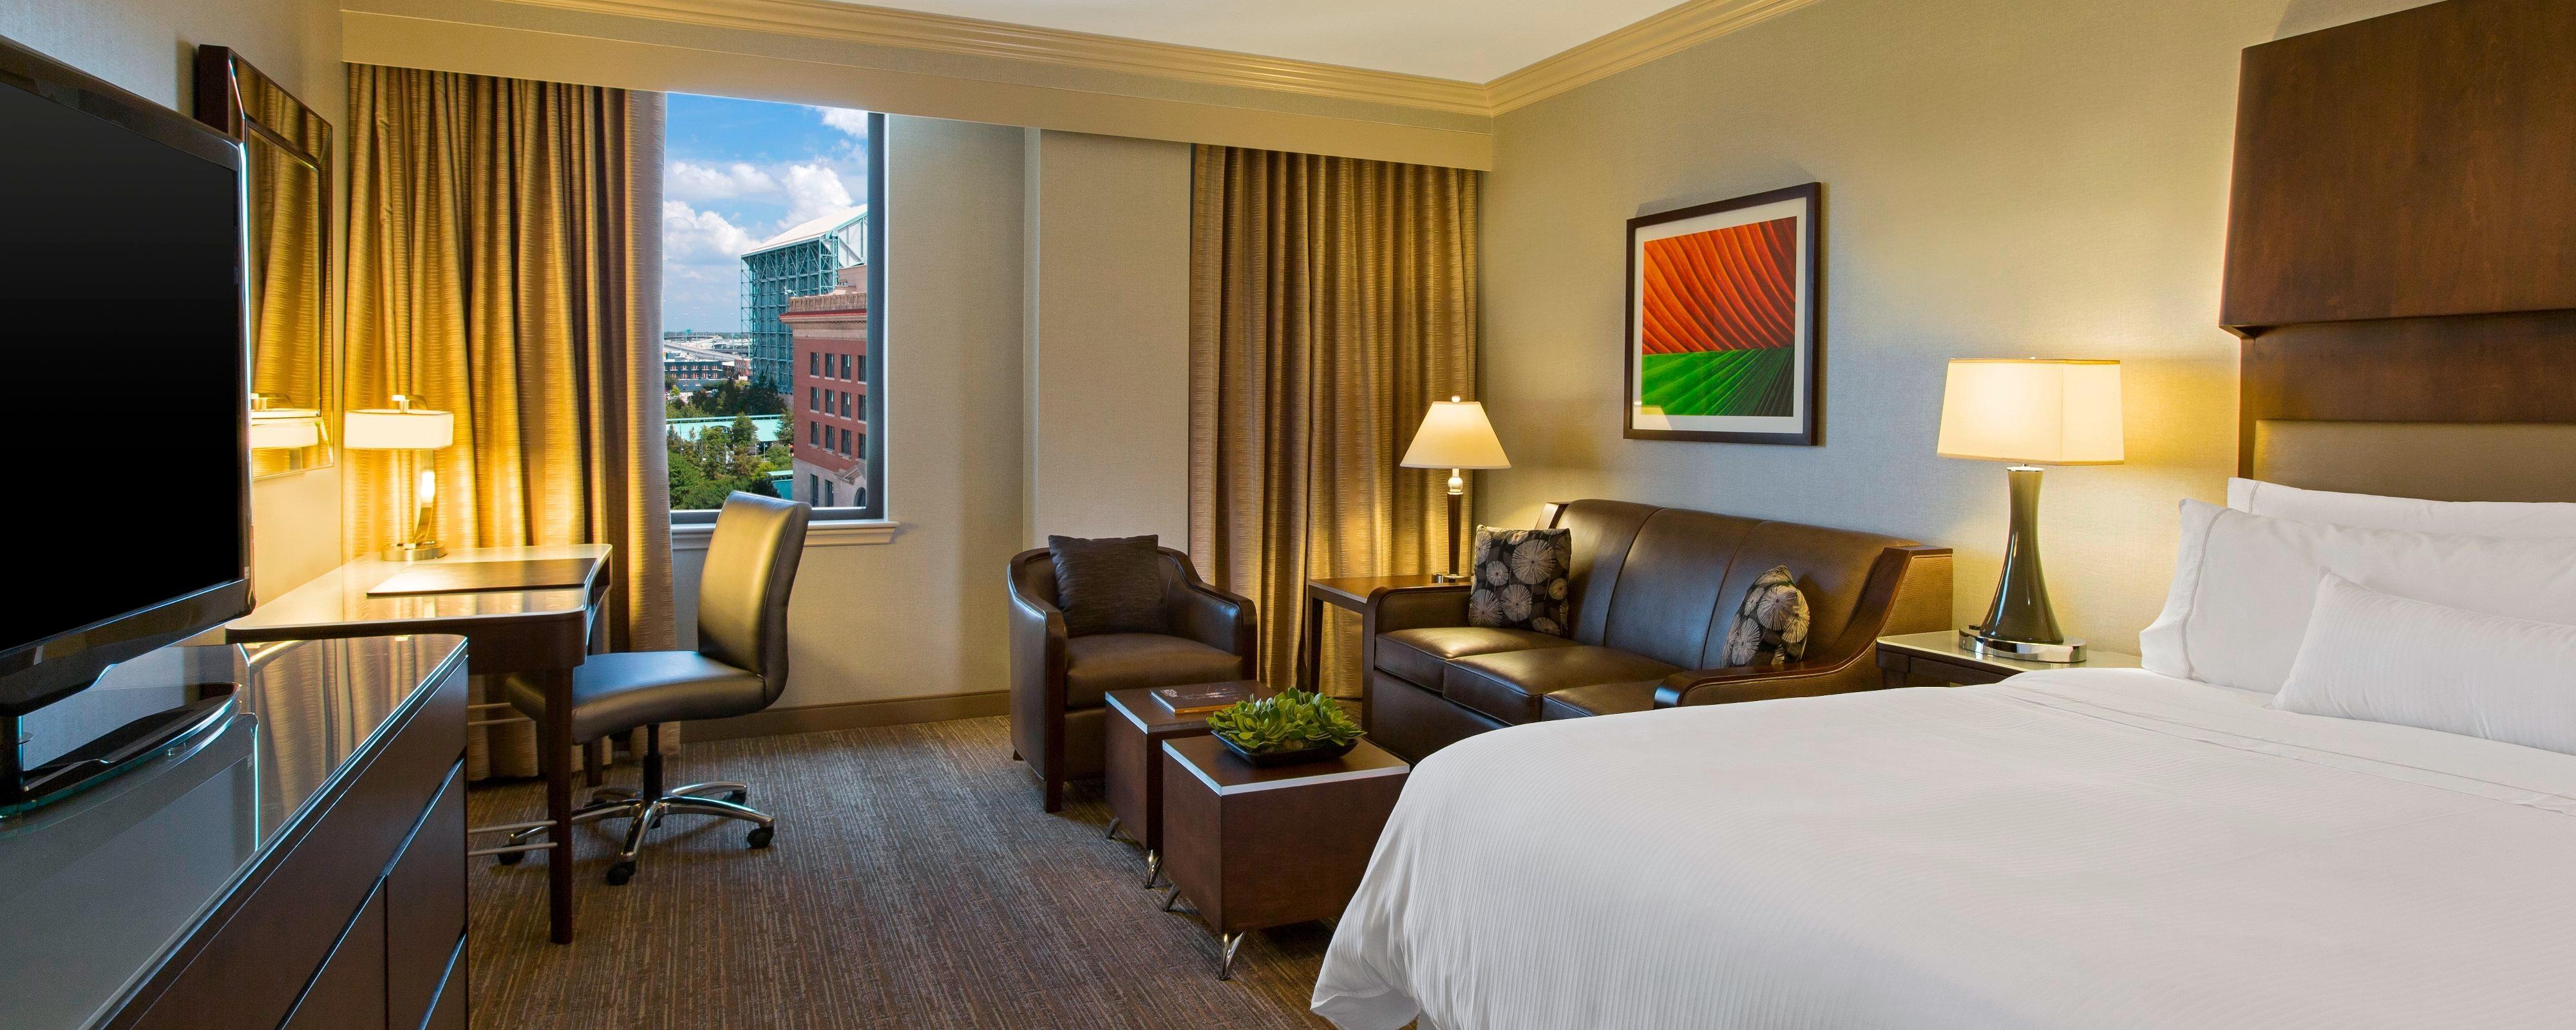 Premium King Guest Room